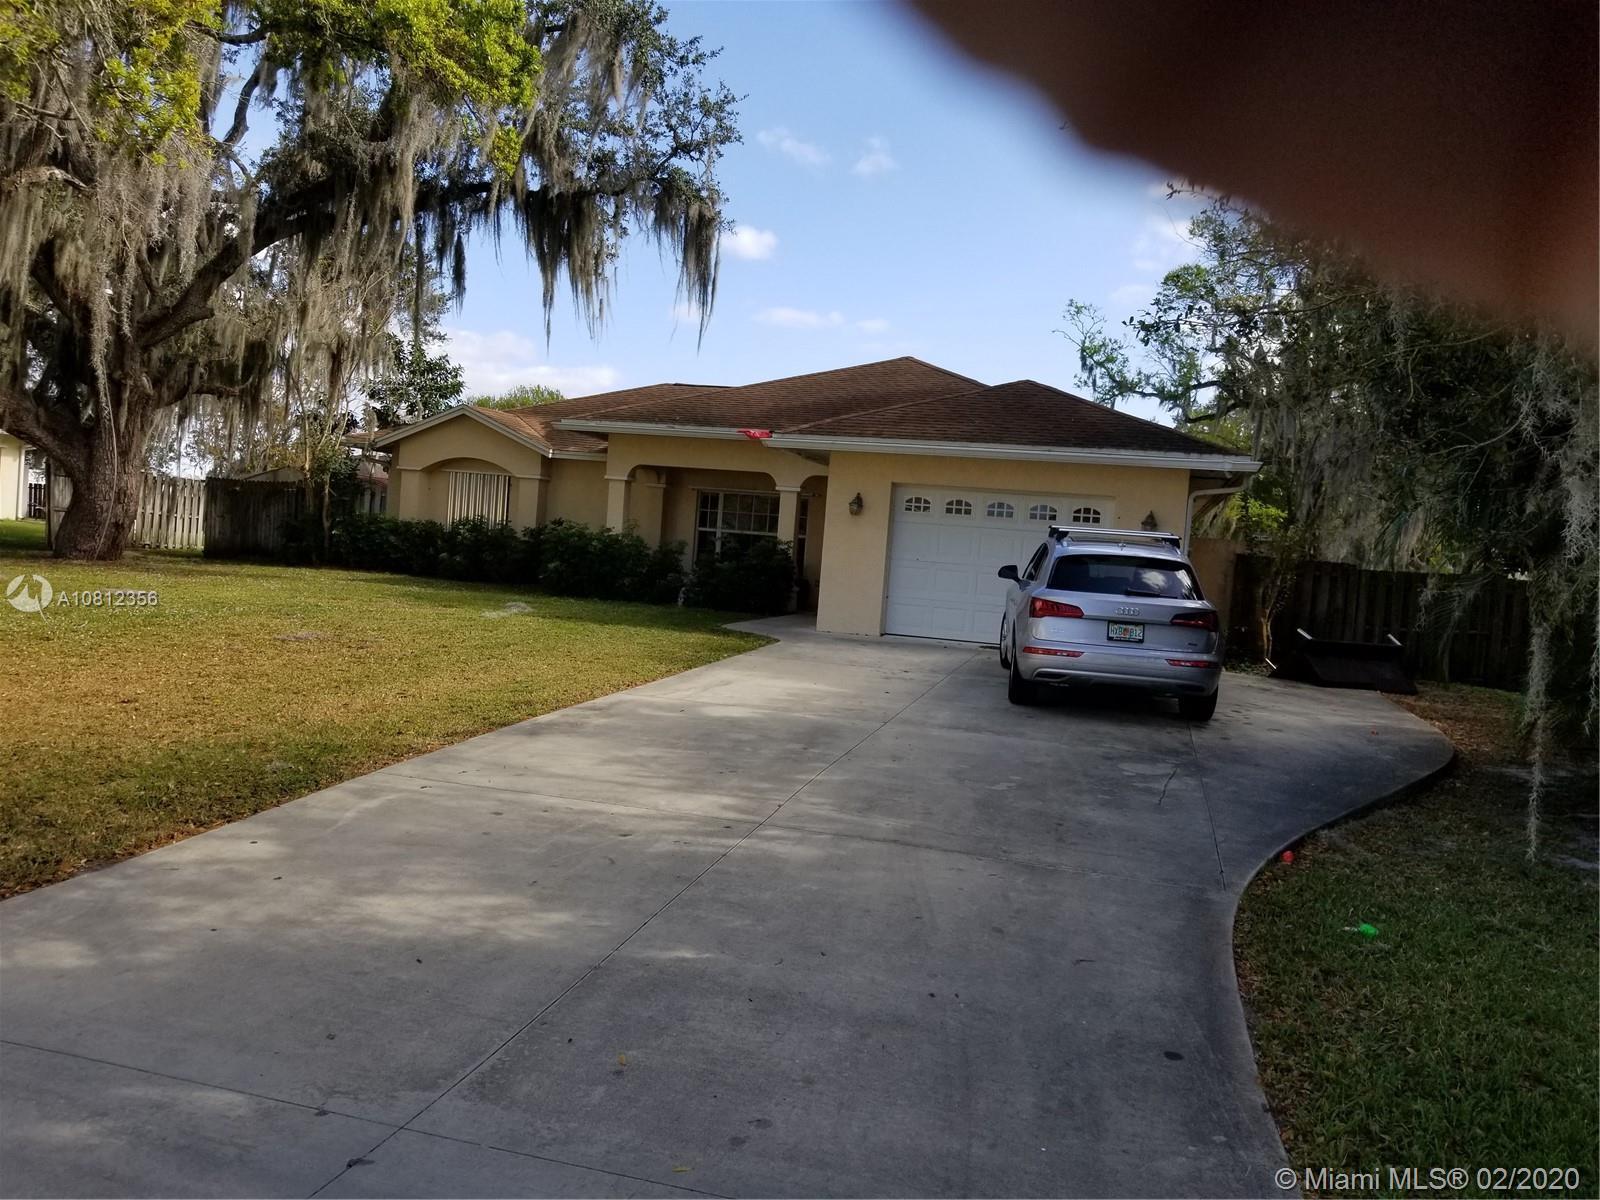 217 SE 5th ave, Okeechobee, FL 34974